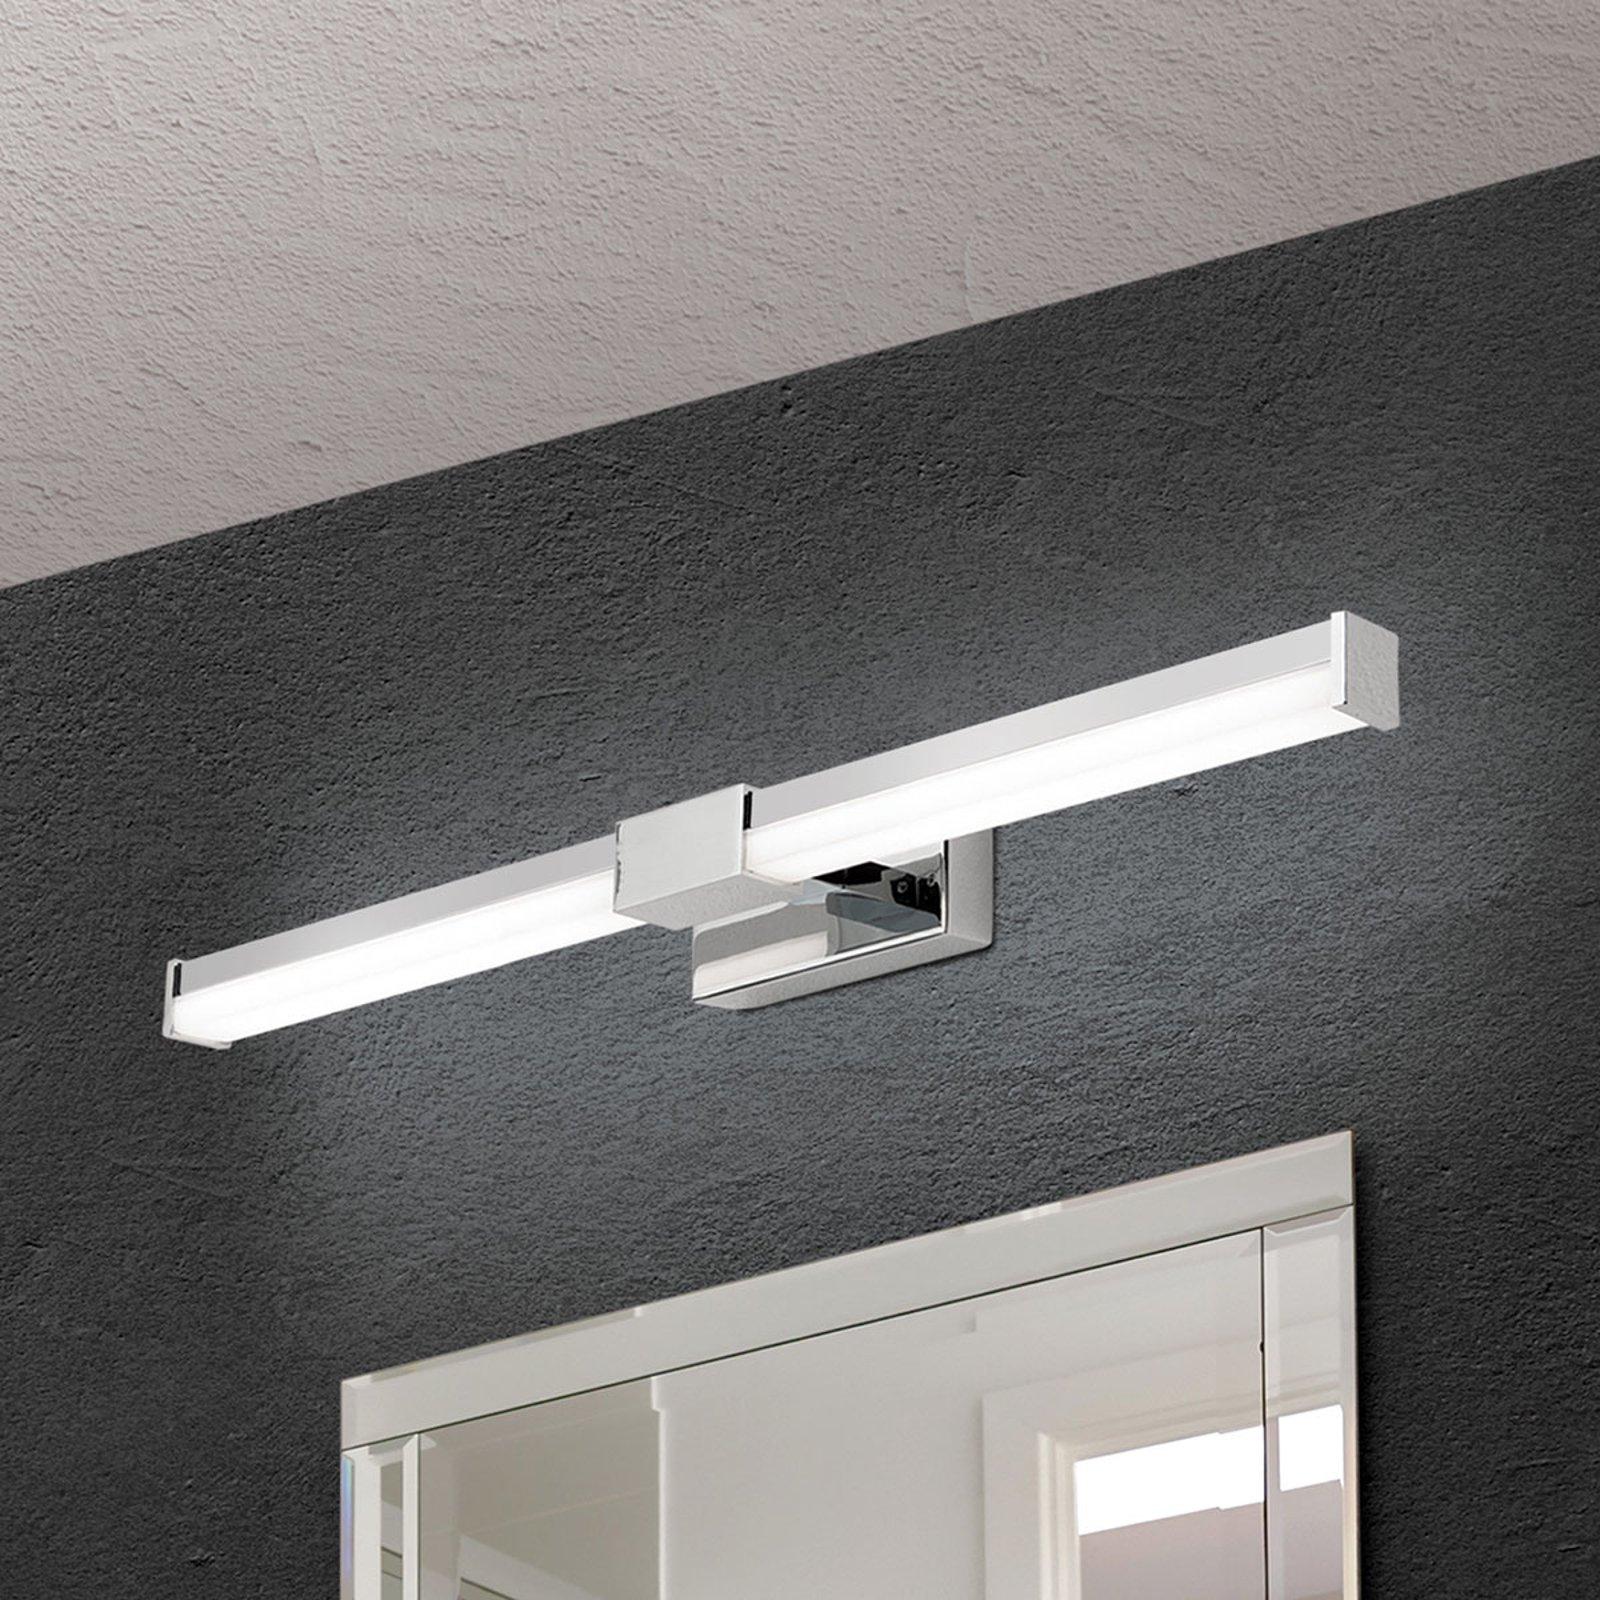 Speillampe til bad Argo med LED 35,5 cm